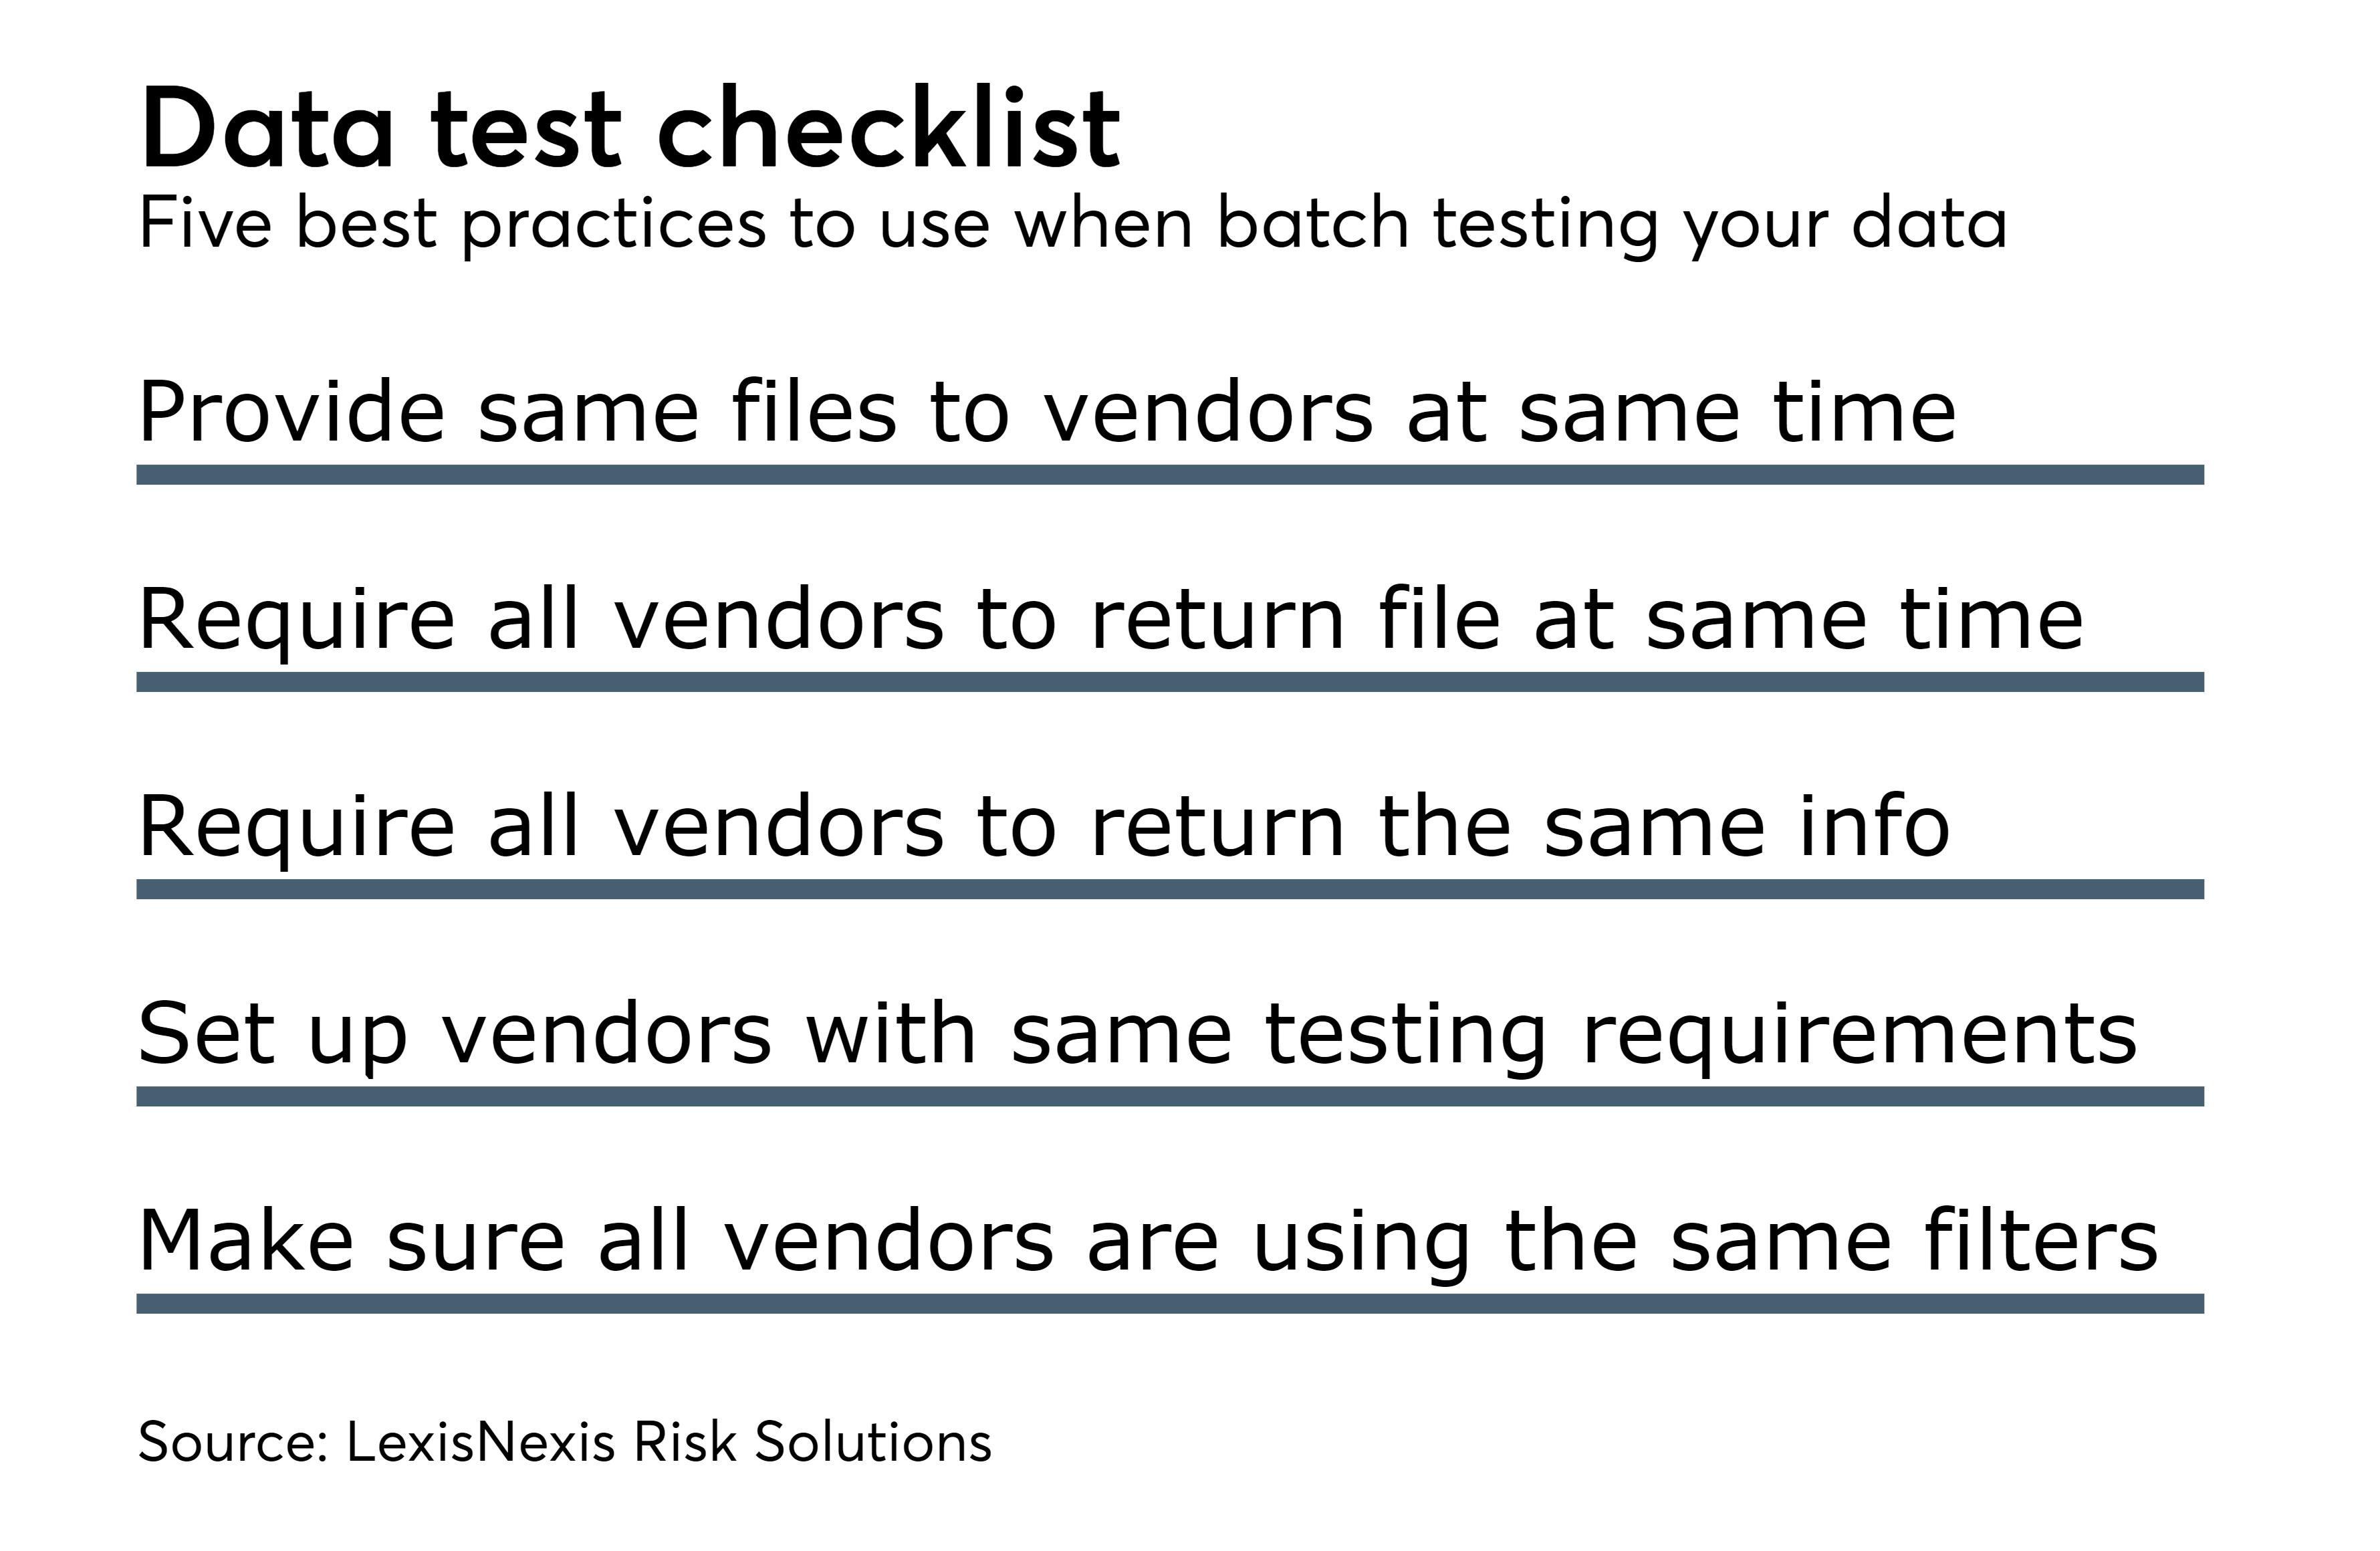 https://assets.sourcemedia.com/31/5e/3d5395014f7cb2138c3c70420417/data-test-checklist-cuj-061417.png